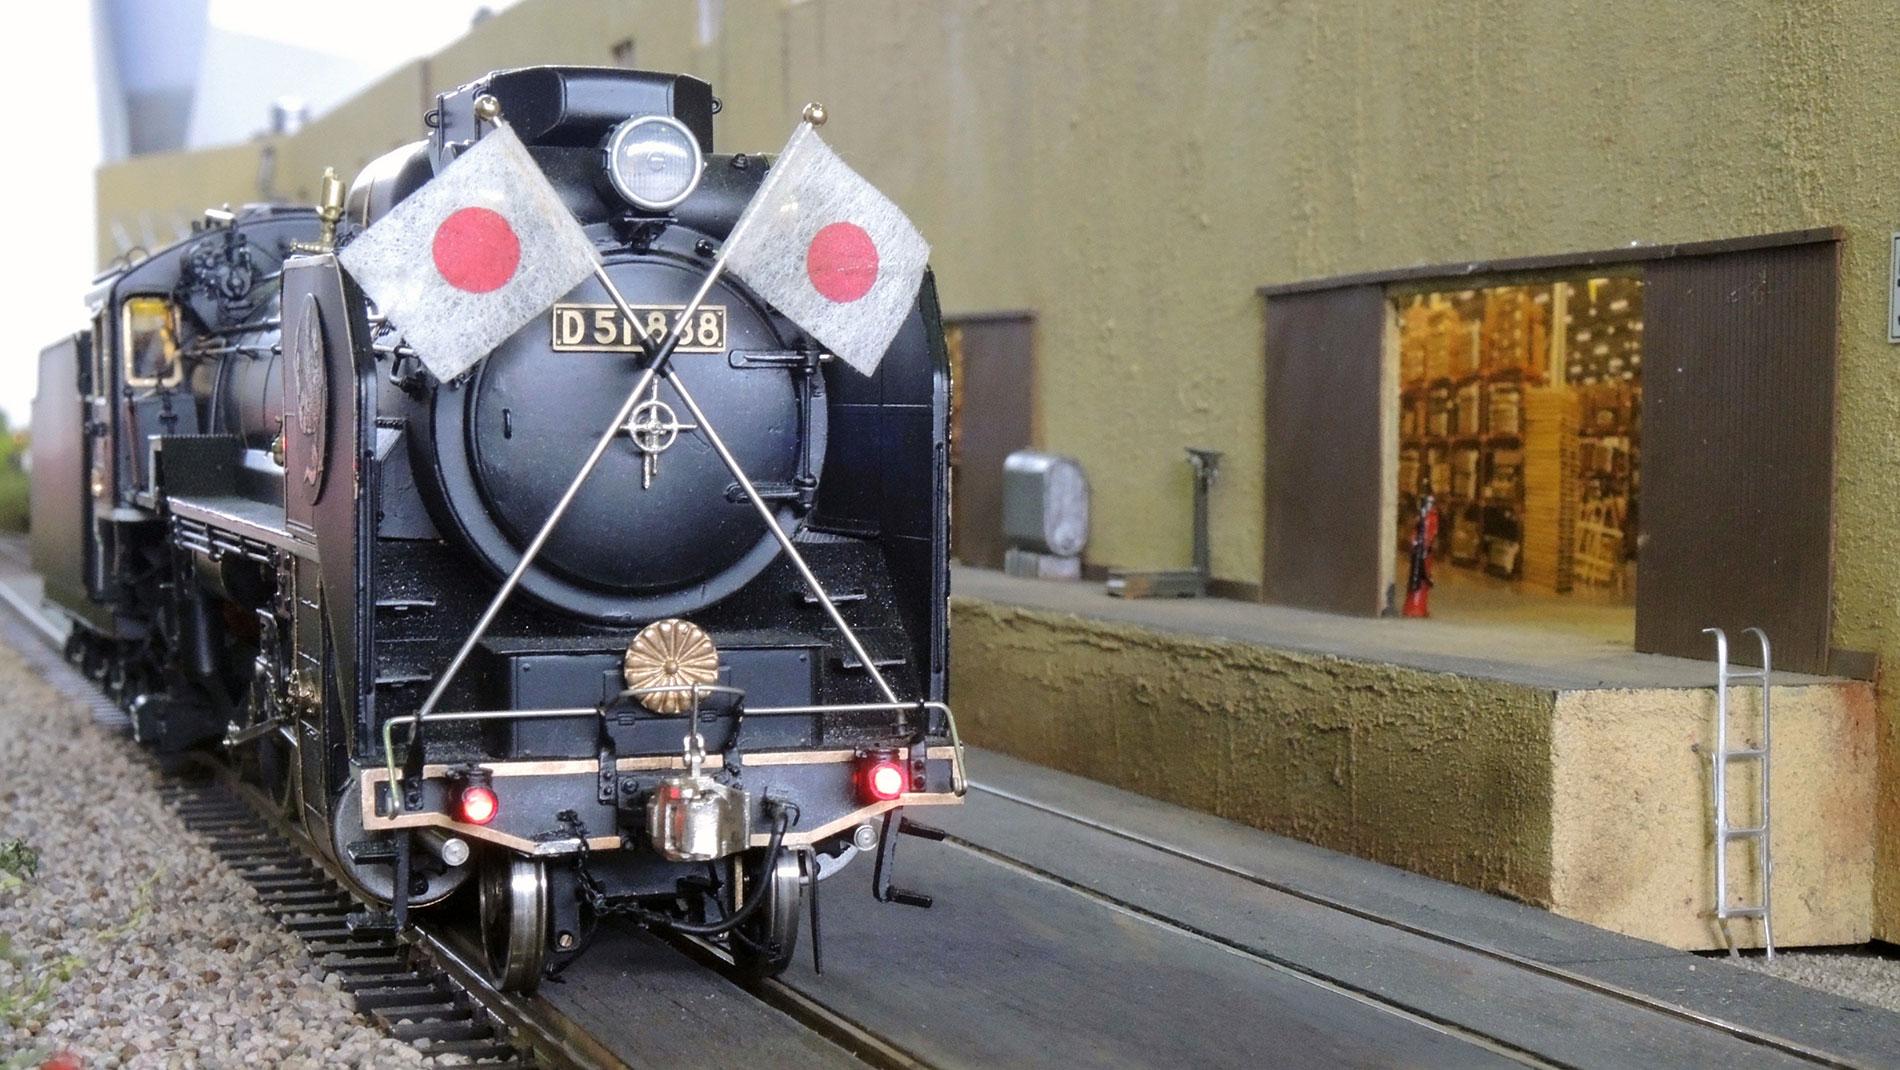 D51-838 Imperial Locomotive. copyright  Urs Häni